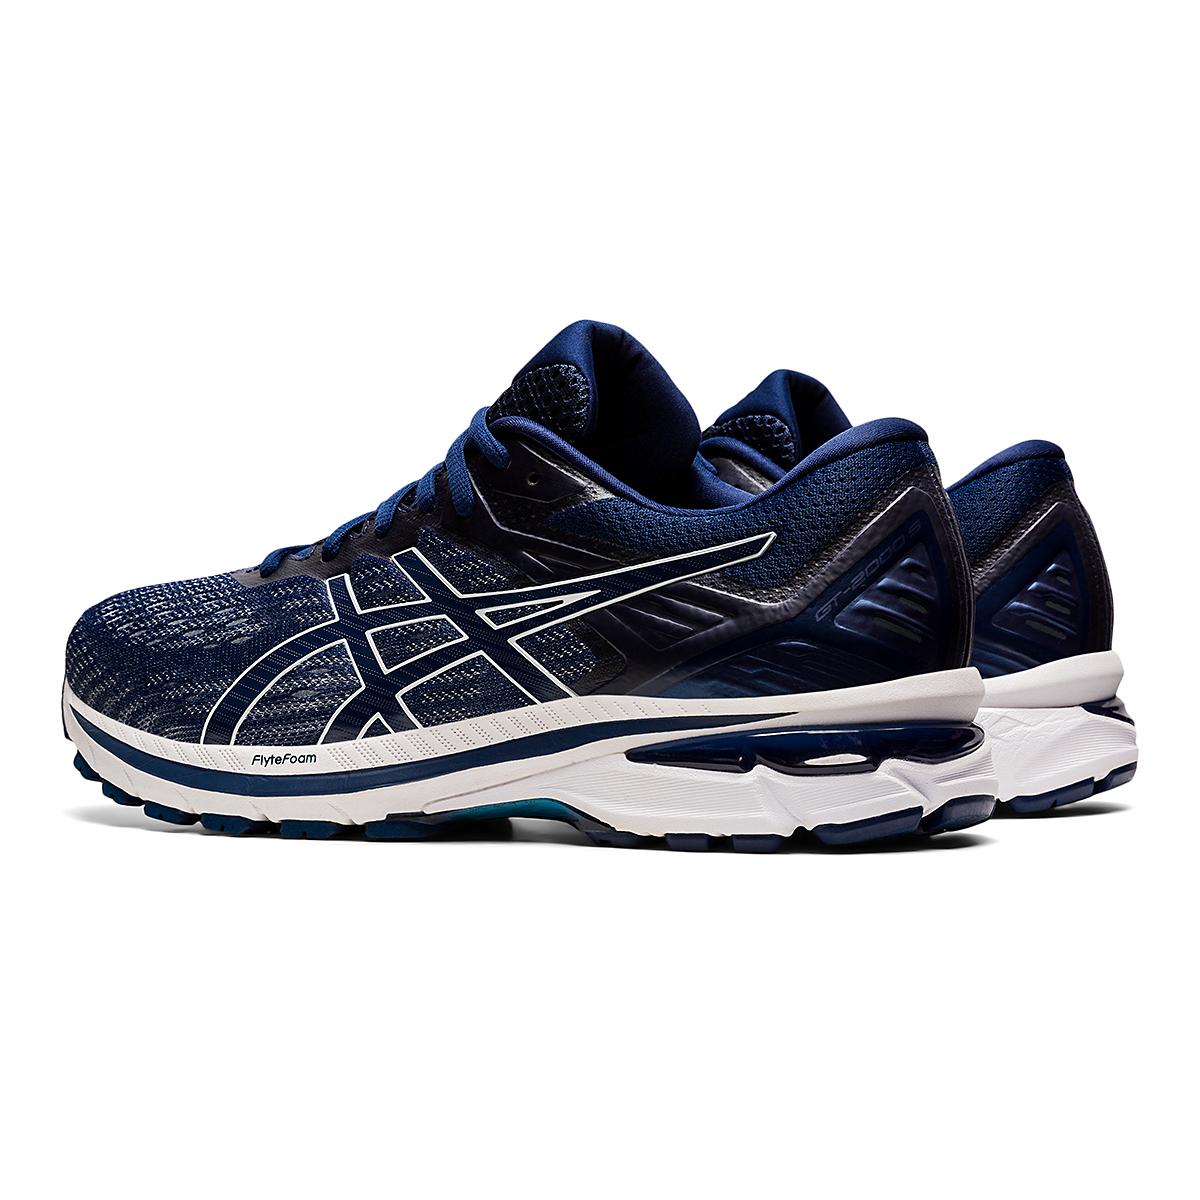 Men's Asics GT-2000 9 Running Shoe - Color: Blue Expanse - Size: 6 - Width: Regular, Blue Expanse, large, image 4